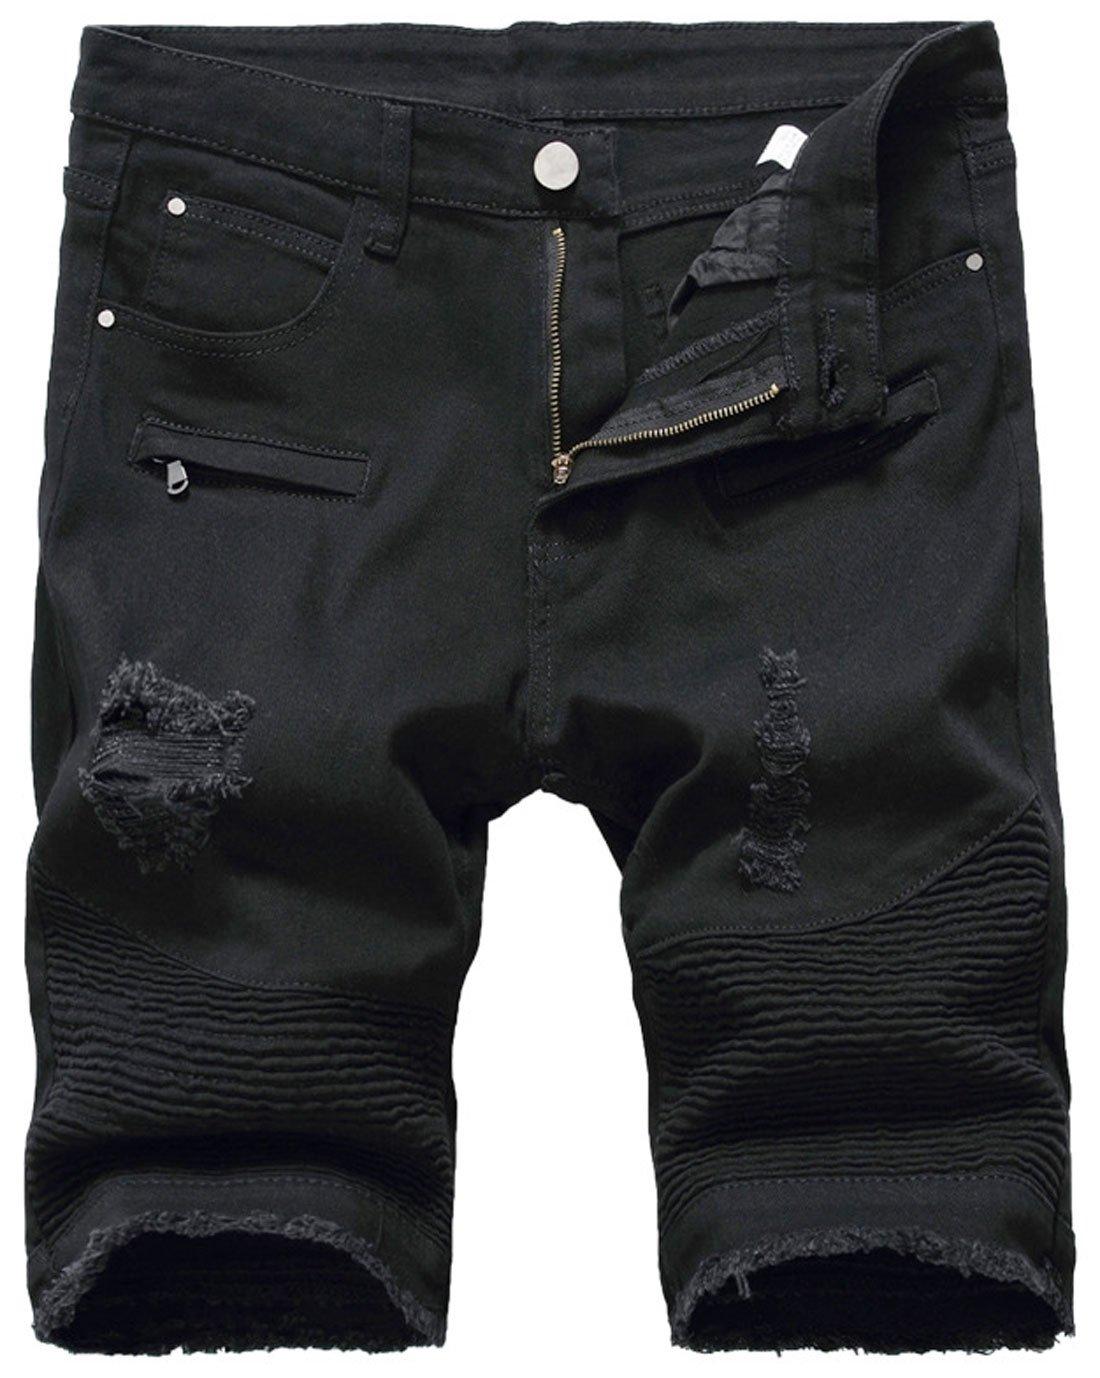 Chouyatou Men's Cool Stylish Wrinkle Performance Slim Ripped Denim Shorts (36, Black)